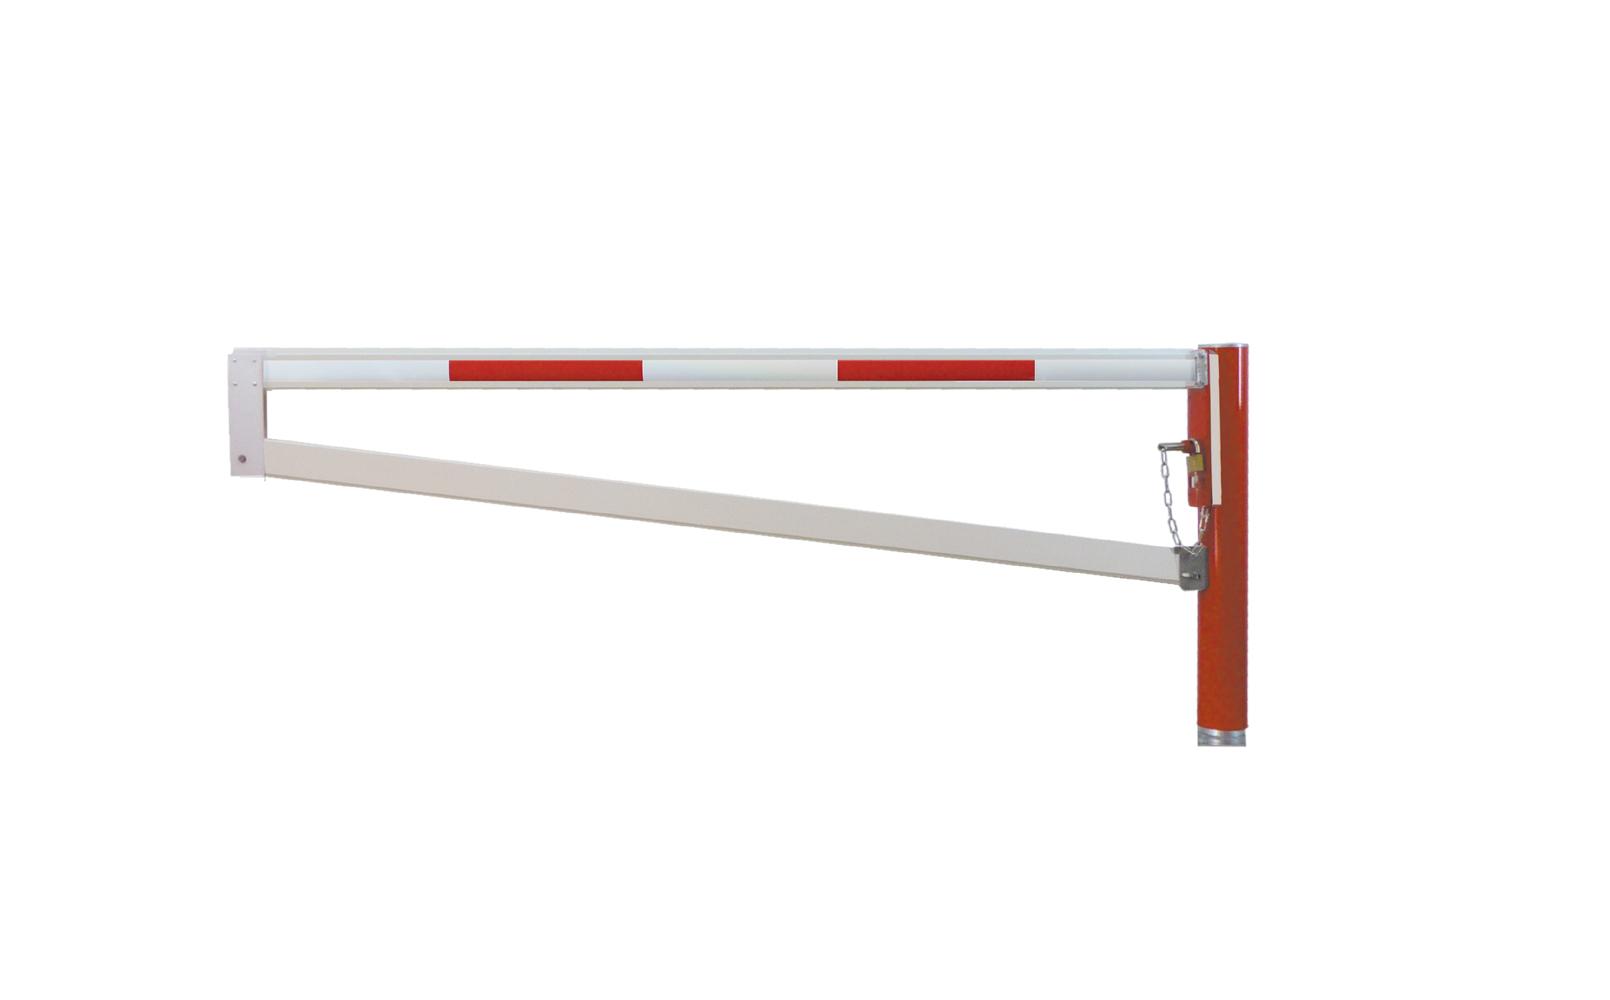 Drehsperre mit trapezförmigen Aluminium-Sperrbügel